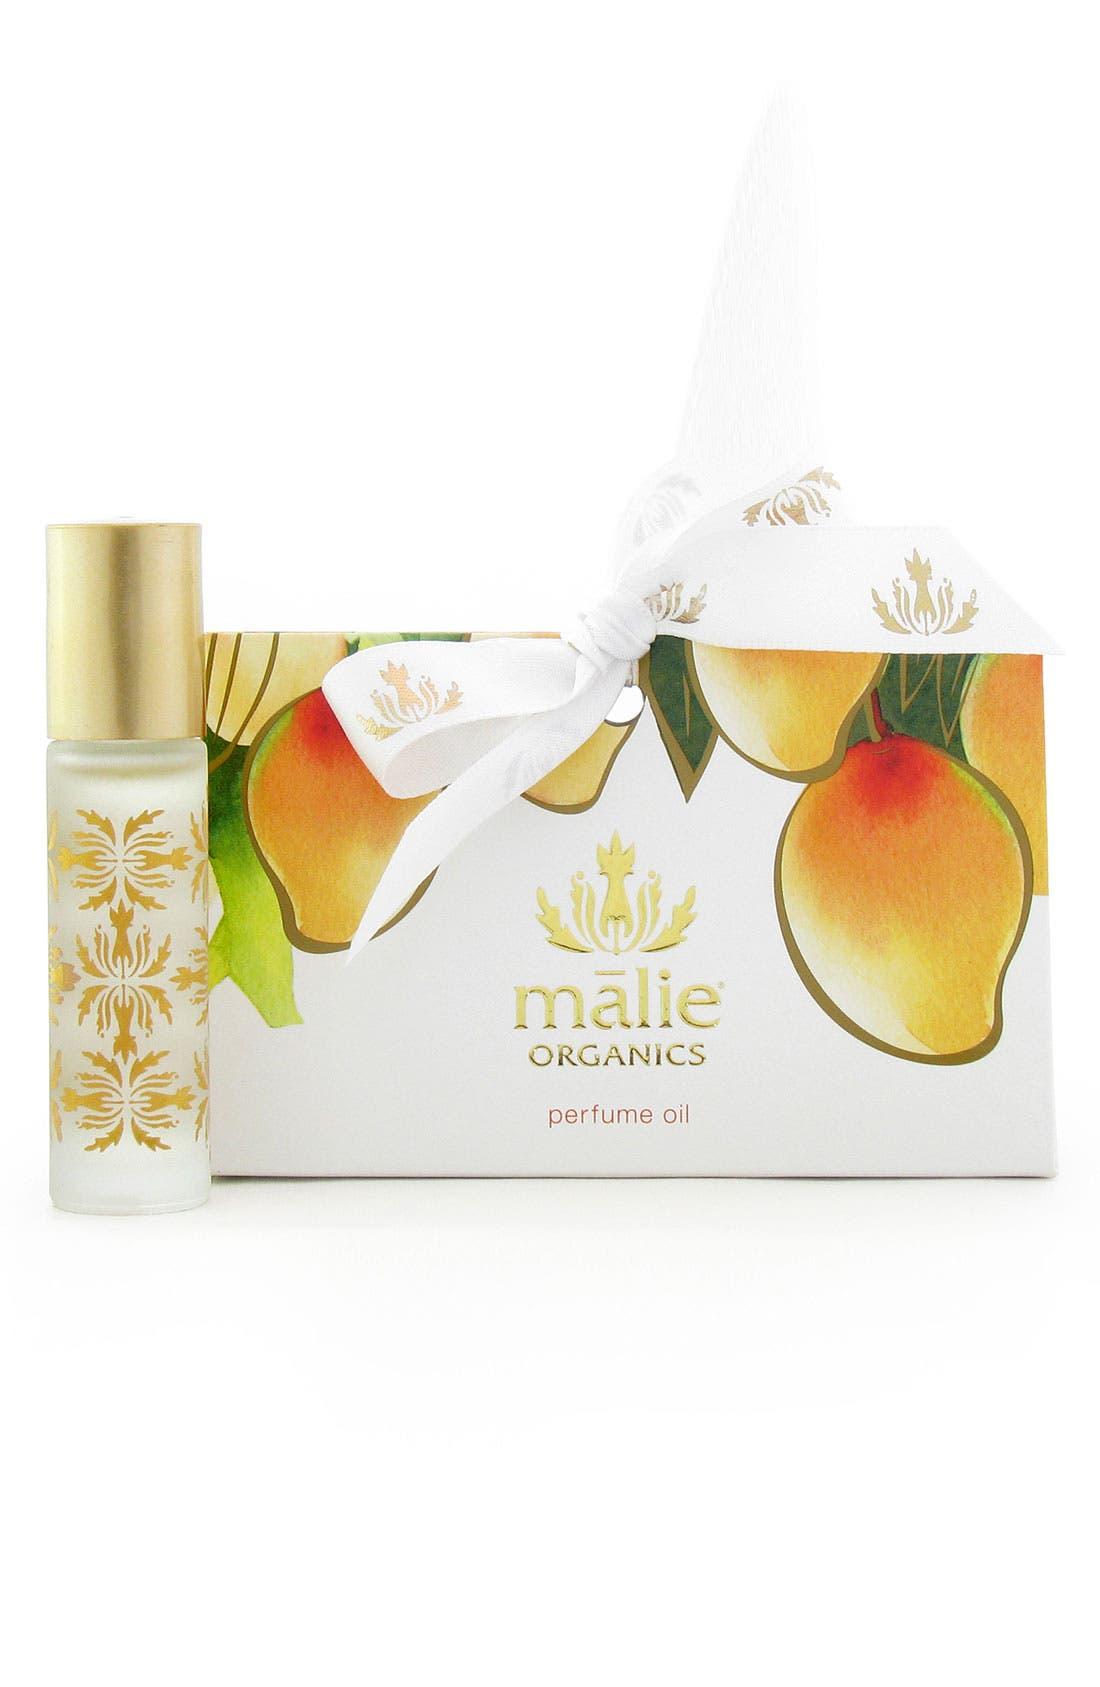 Malie Organics Mango Nectar Organic Roll-On Perfume Oil